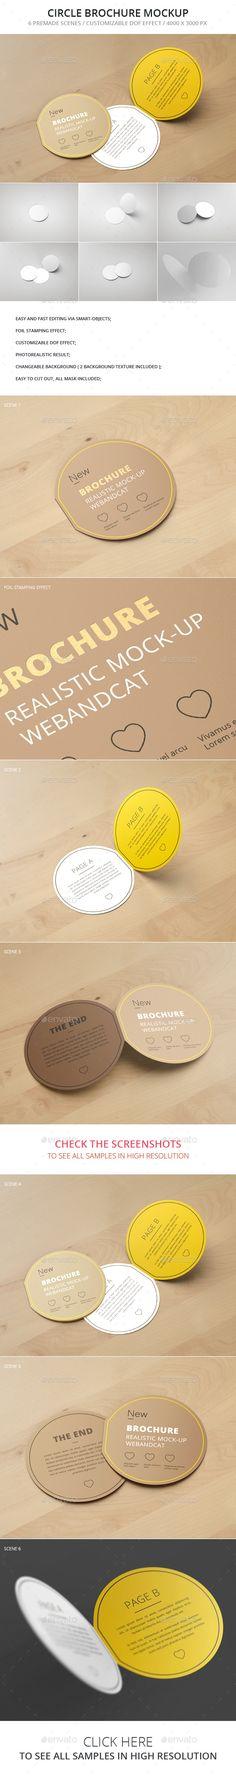 Circle Bi-Fold Brochure Mockup. Download here: http://graphicriver.net/item/circle-bifold-brochure-mockup/14694810?ref=ksioks